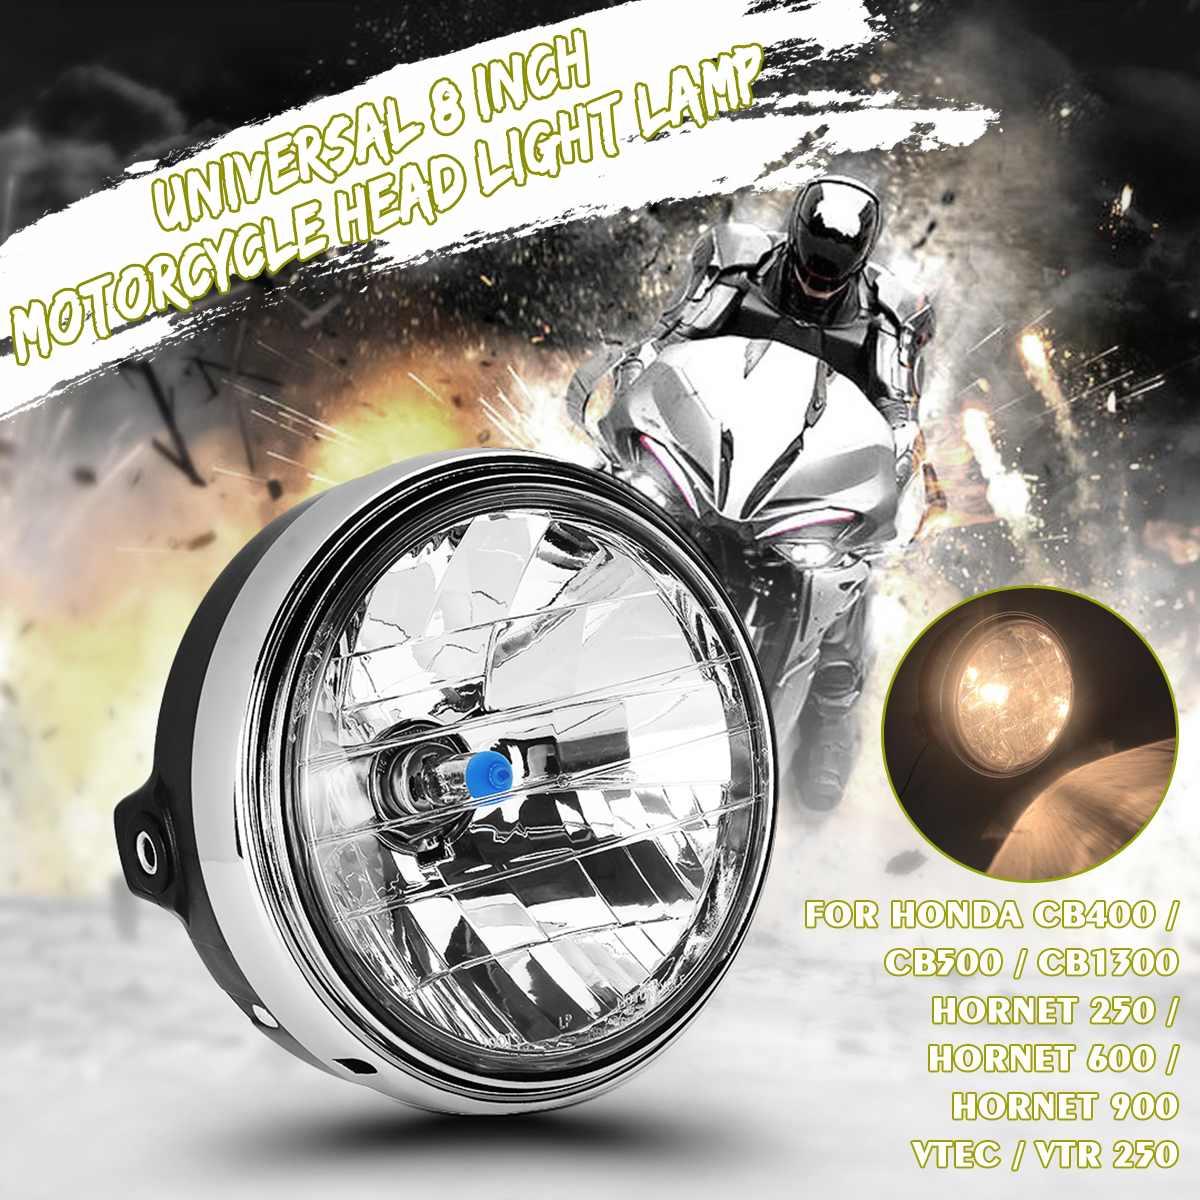 12V 35W 8 Inch Universals Motorcycle Headlight For Hon Da Cb400 Cb500 Cb1300 Hor Net 250 600 900 Vtec Vtr250 Running Light